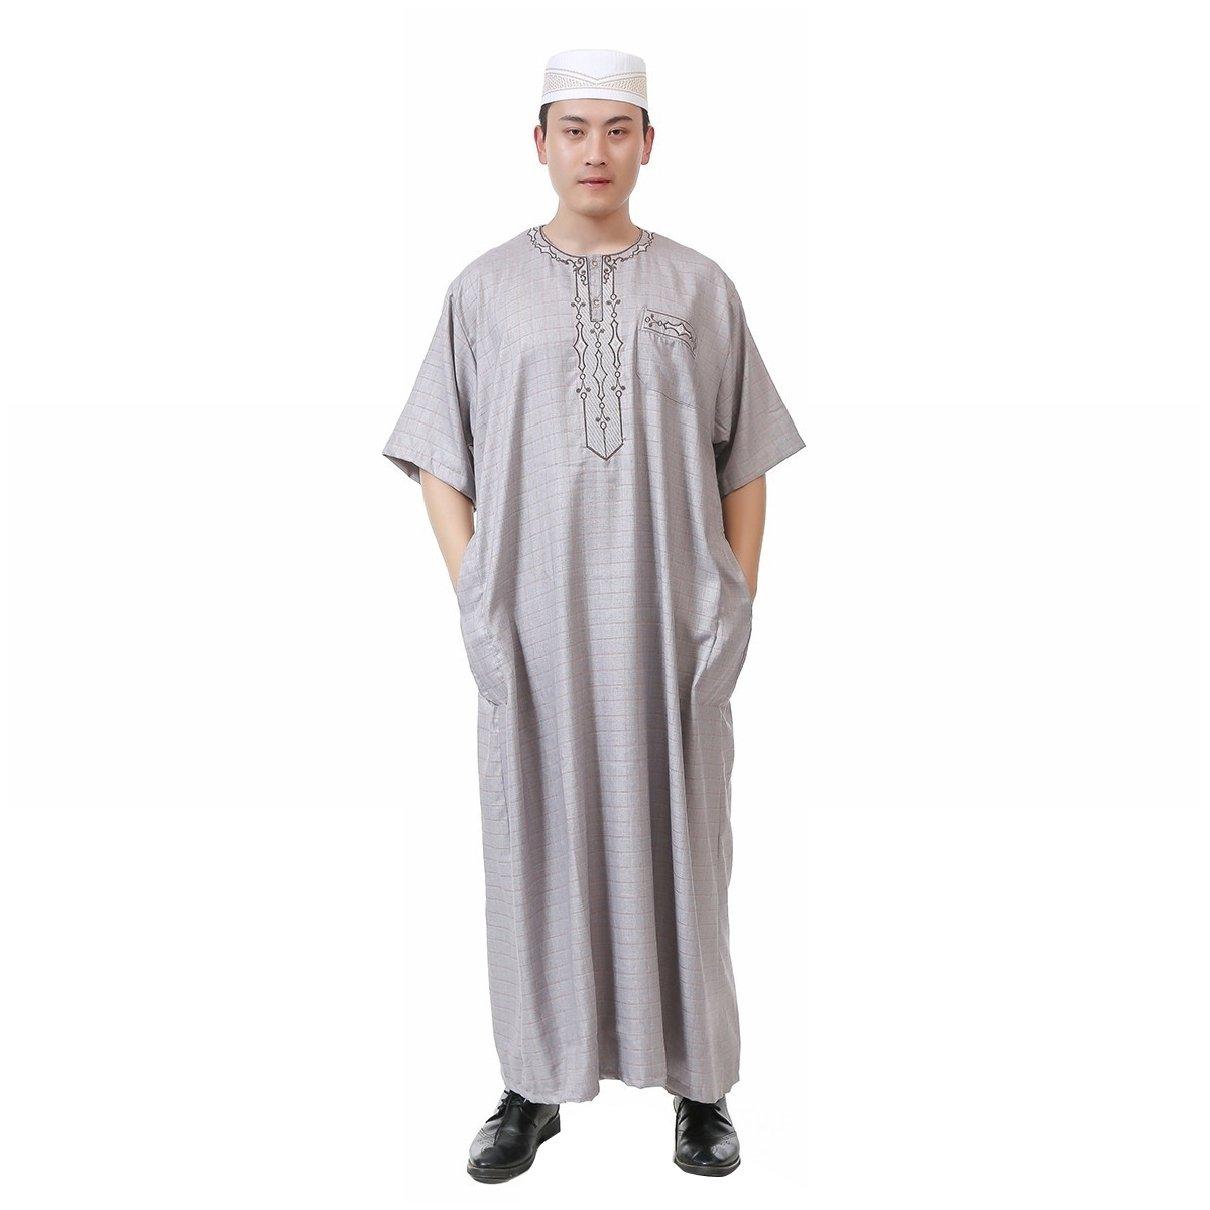 Highisa Men's Cotton Linen Blend Crew-Neck Short-Sleeve Muslim Thobe Light Grey 56